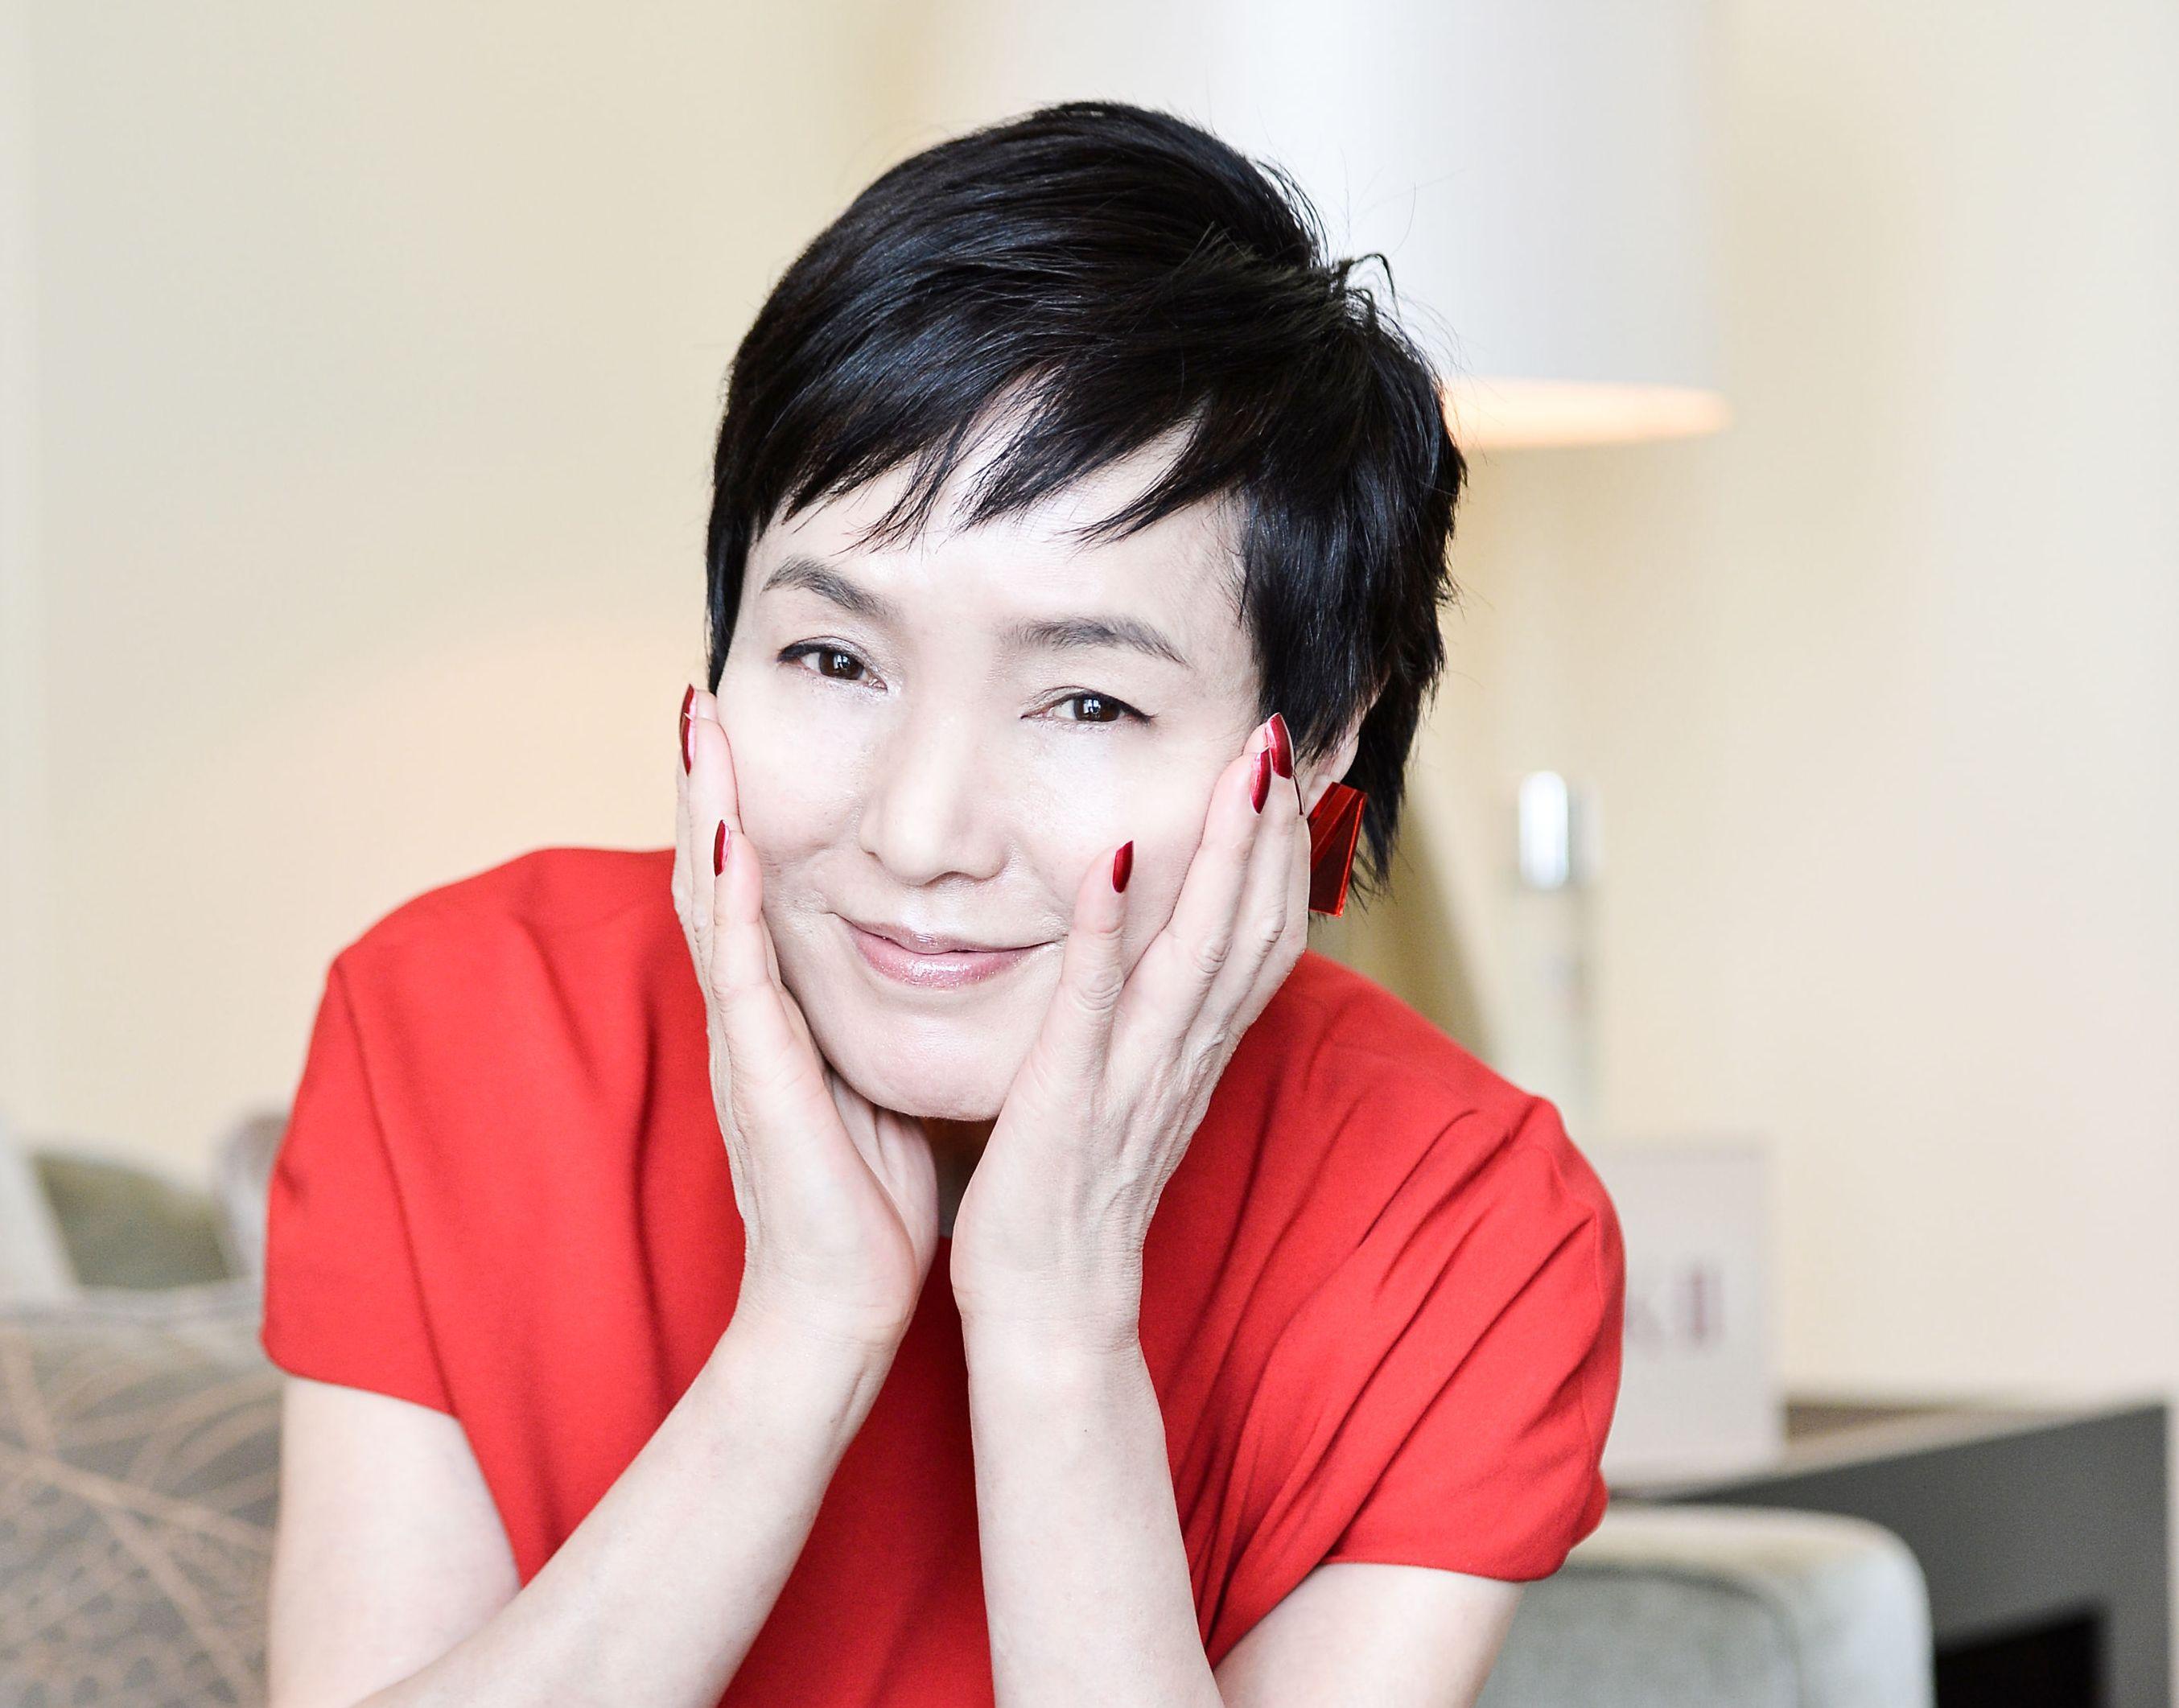 Japanese actress Kaori Momoi, 61, is one of SK II\'s brand ambassadors.